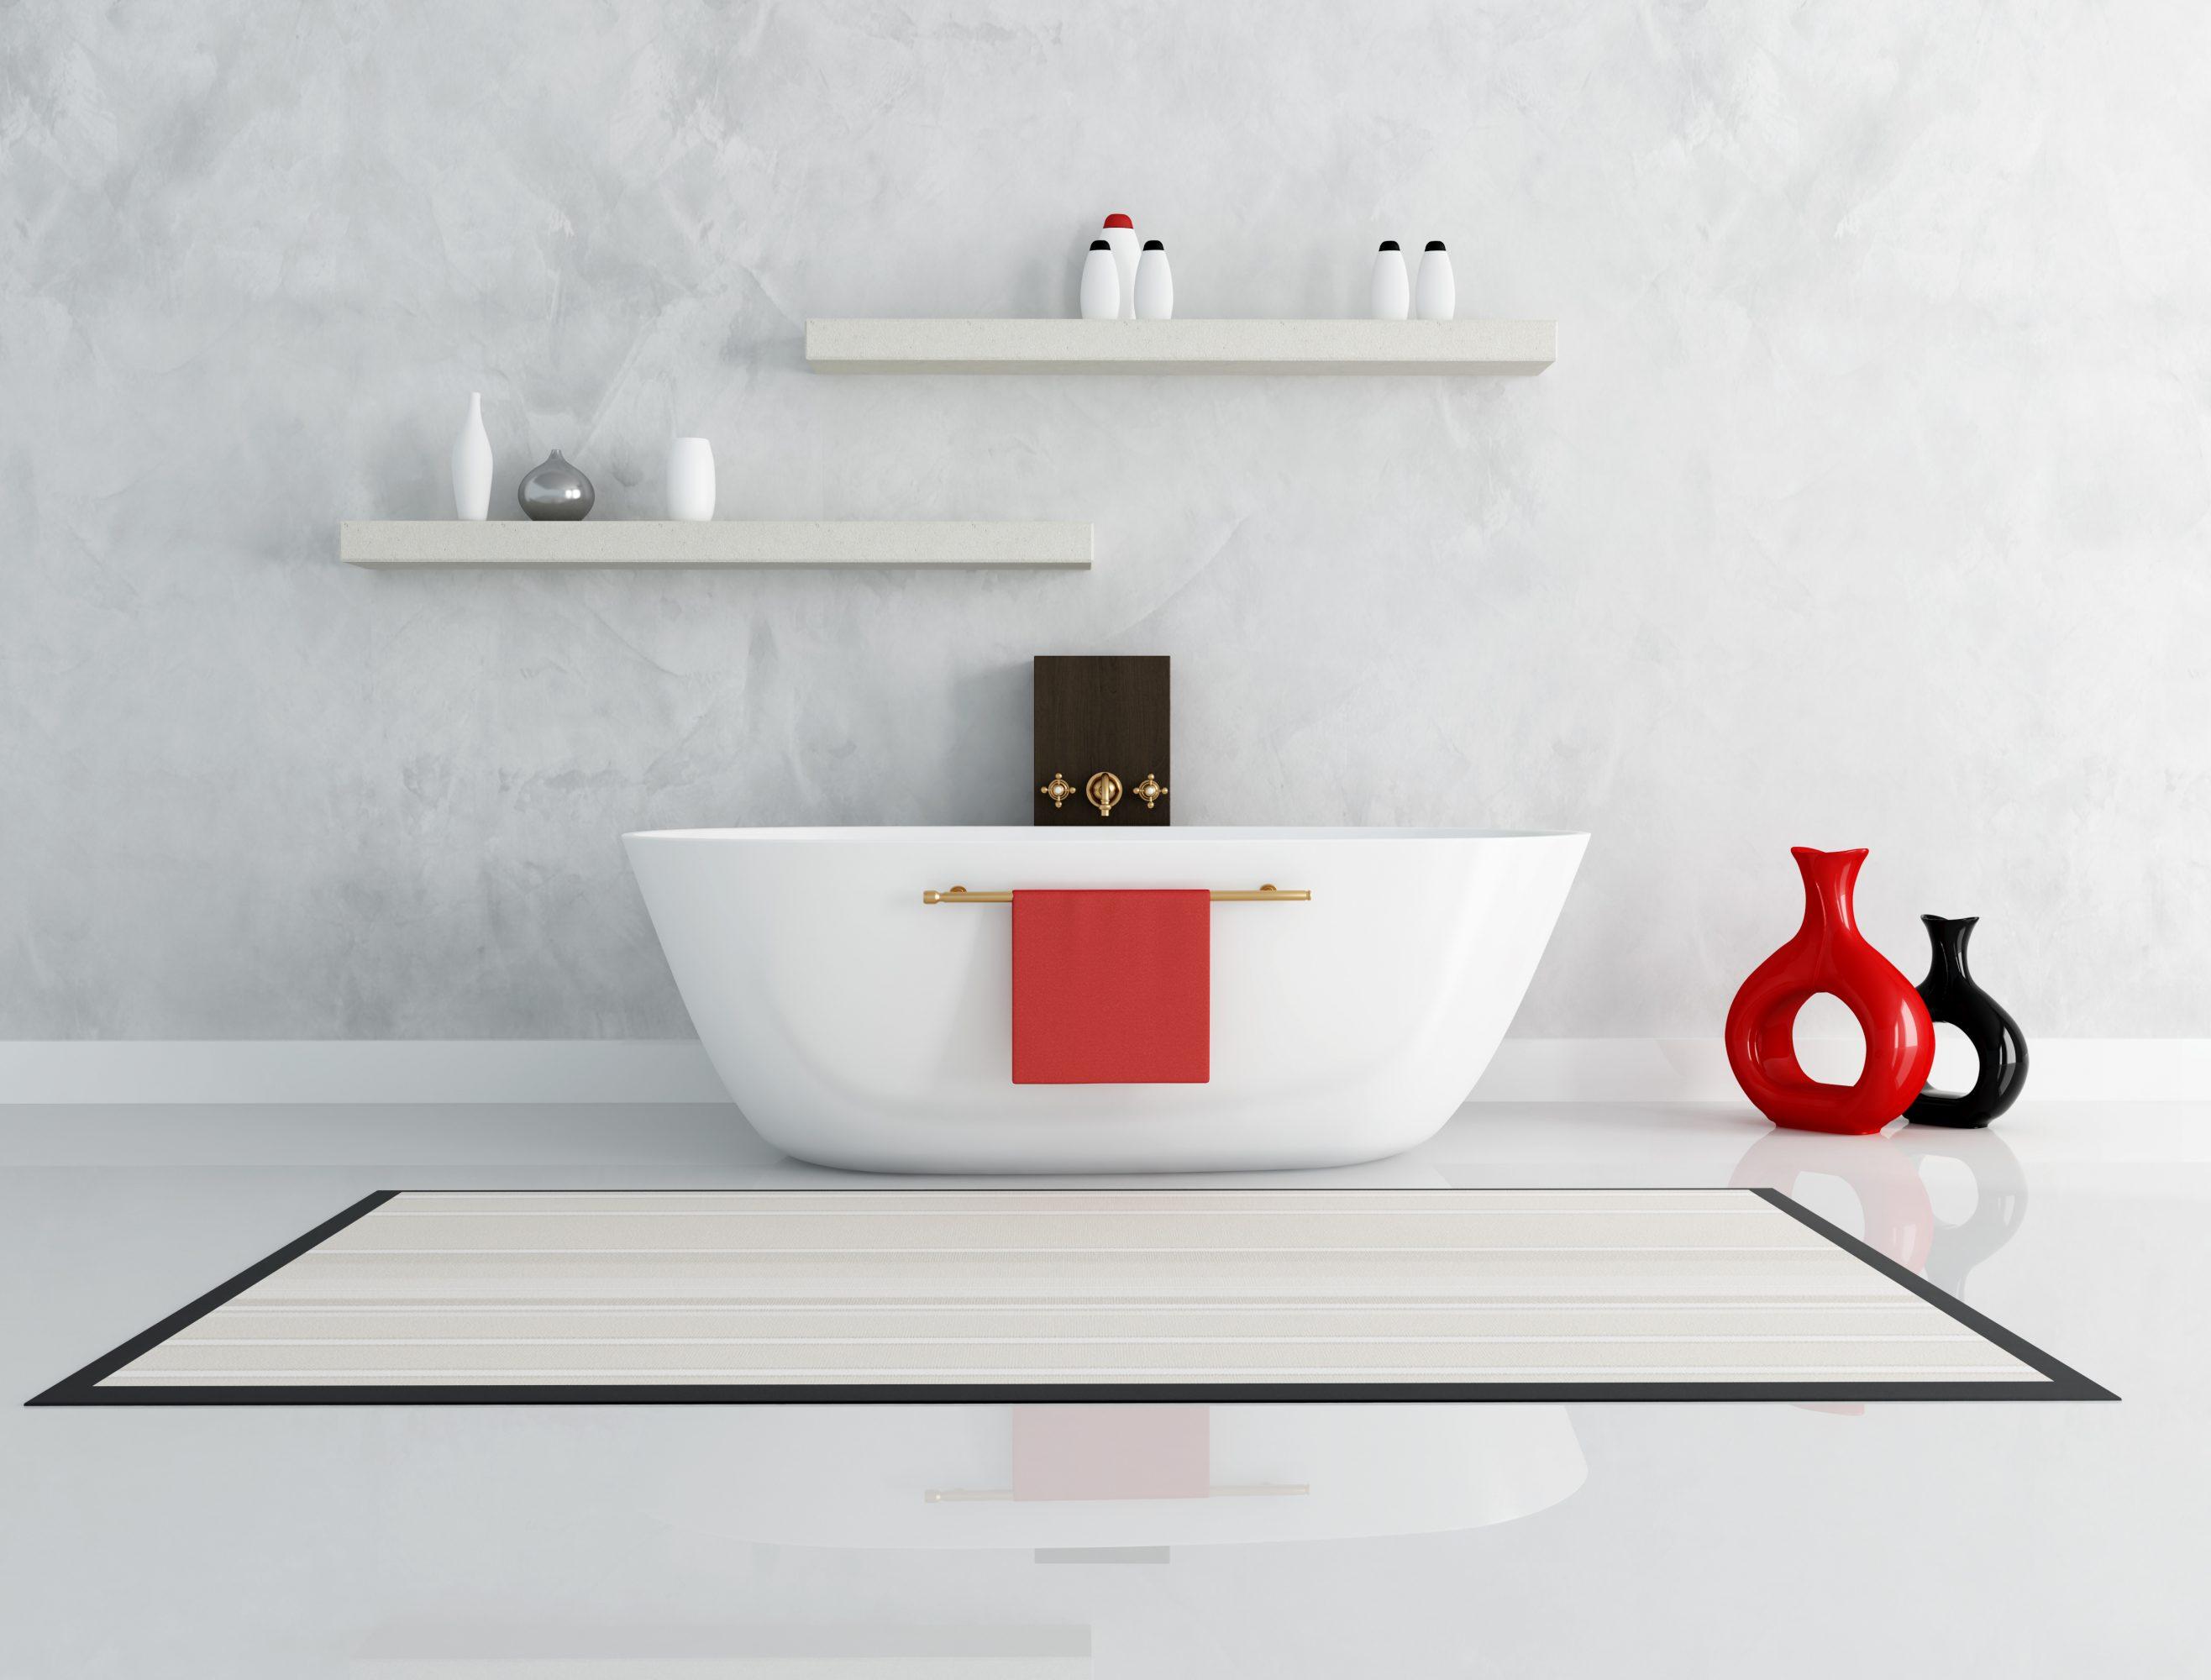 Le b ton cir dans la salle de bains blog harmony b ton for Application du beton cire